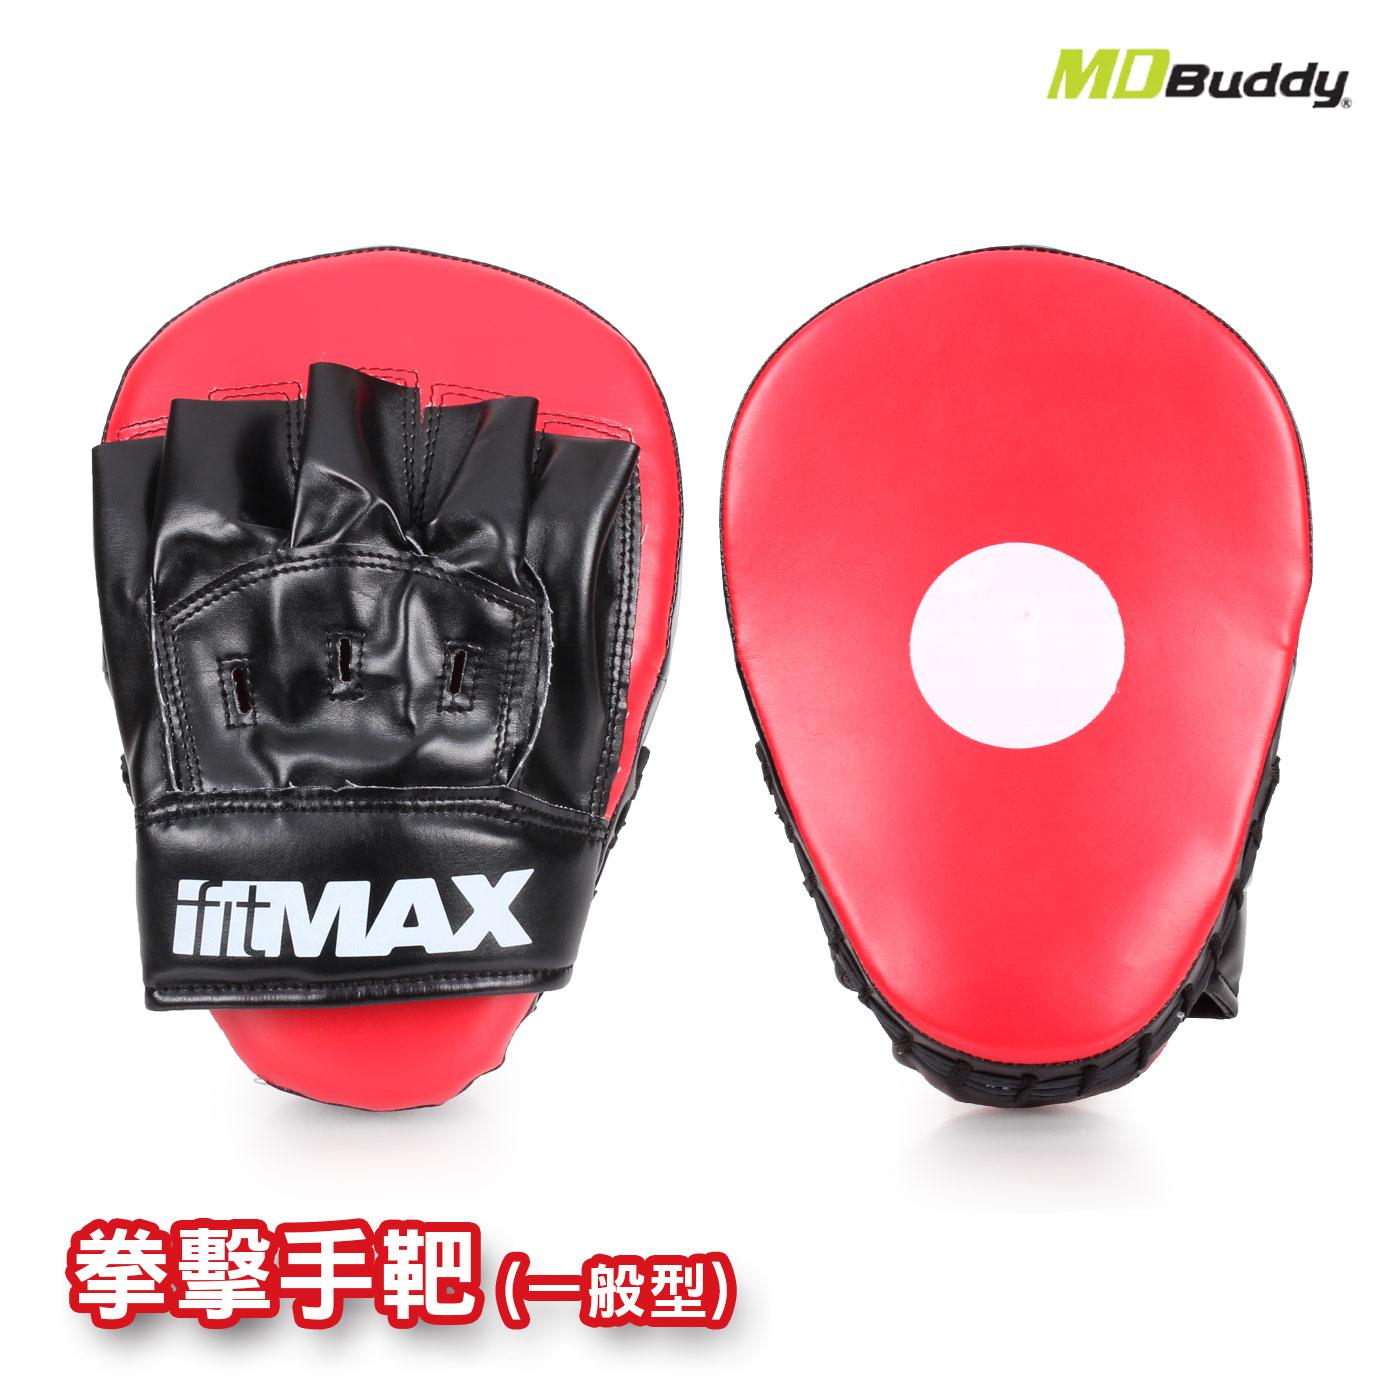 MDBuddy 拳擊手靶(一般型) 6025601 - 隨機